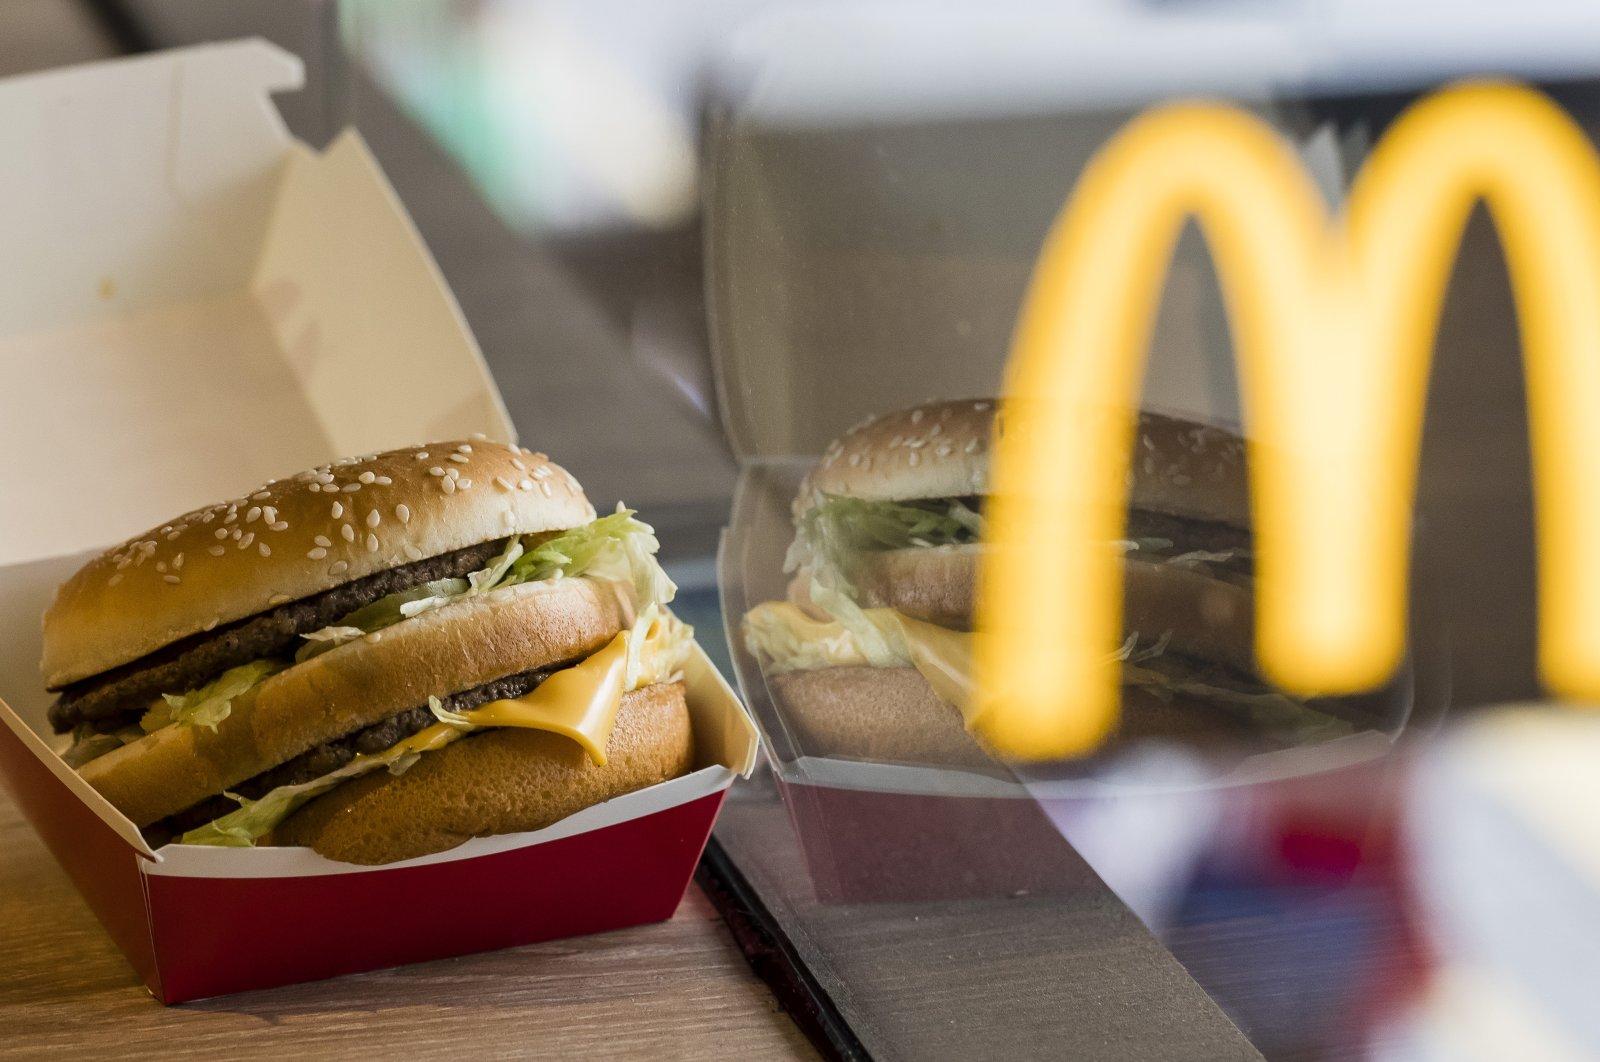 AMcDonald's Big Mac is seen alongside the blurred McDonald's golden arches logo, inHong Kong,Aug. 2, 2018. (Getty Images)